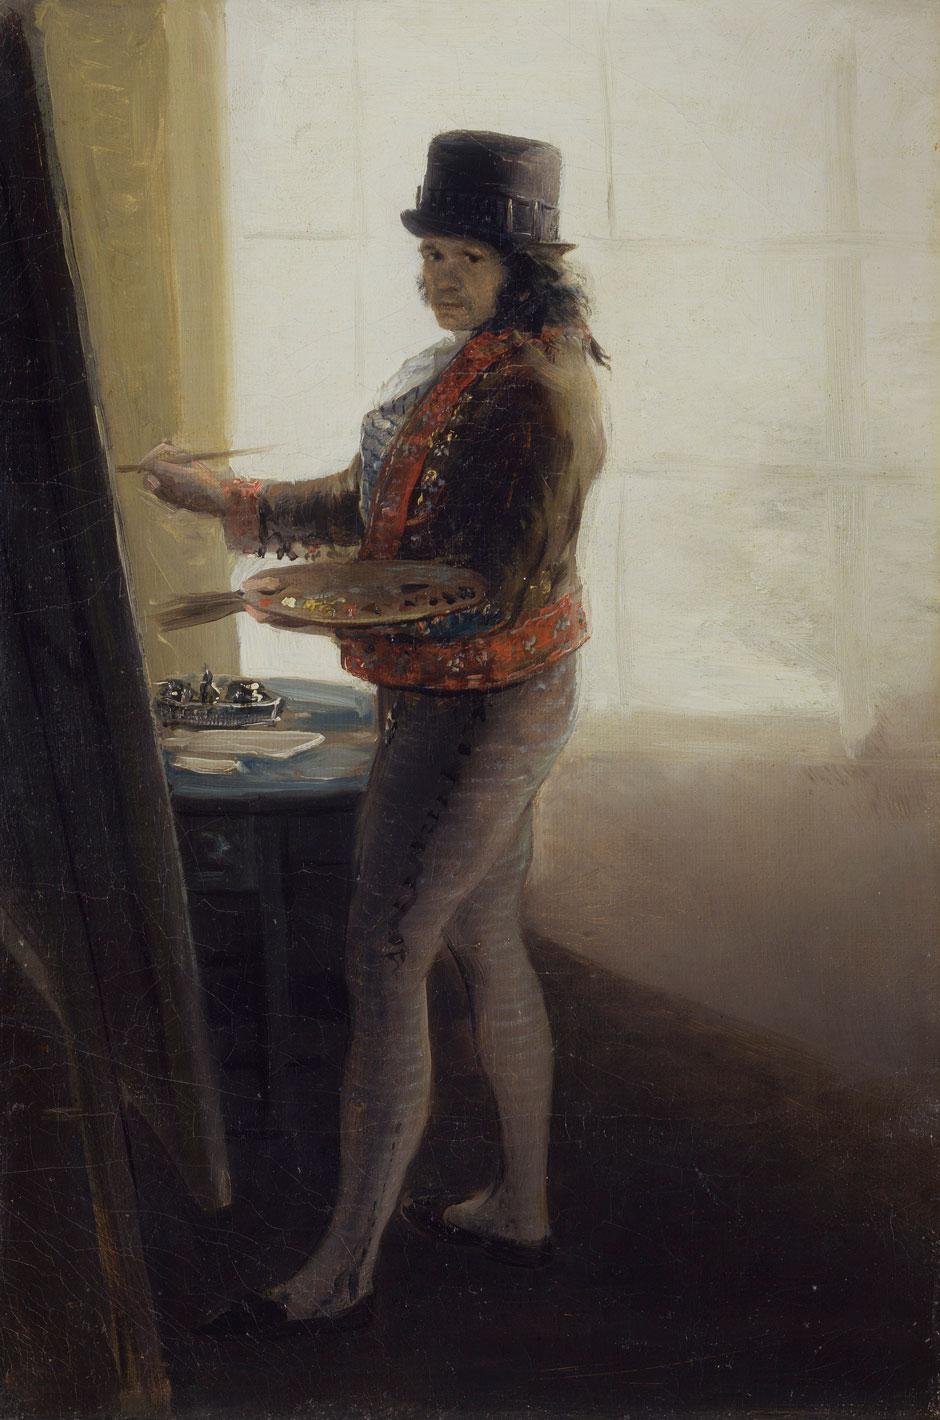 Francisco Goya: Self-Portrait While Painting, circa 1795